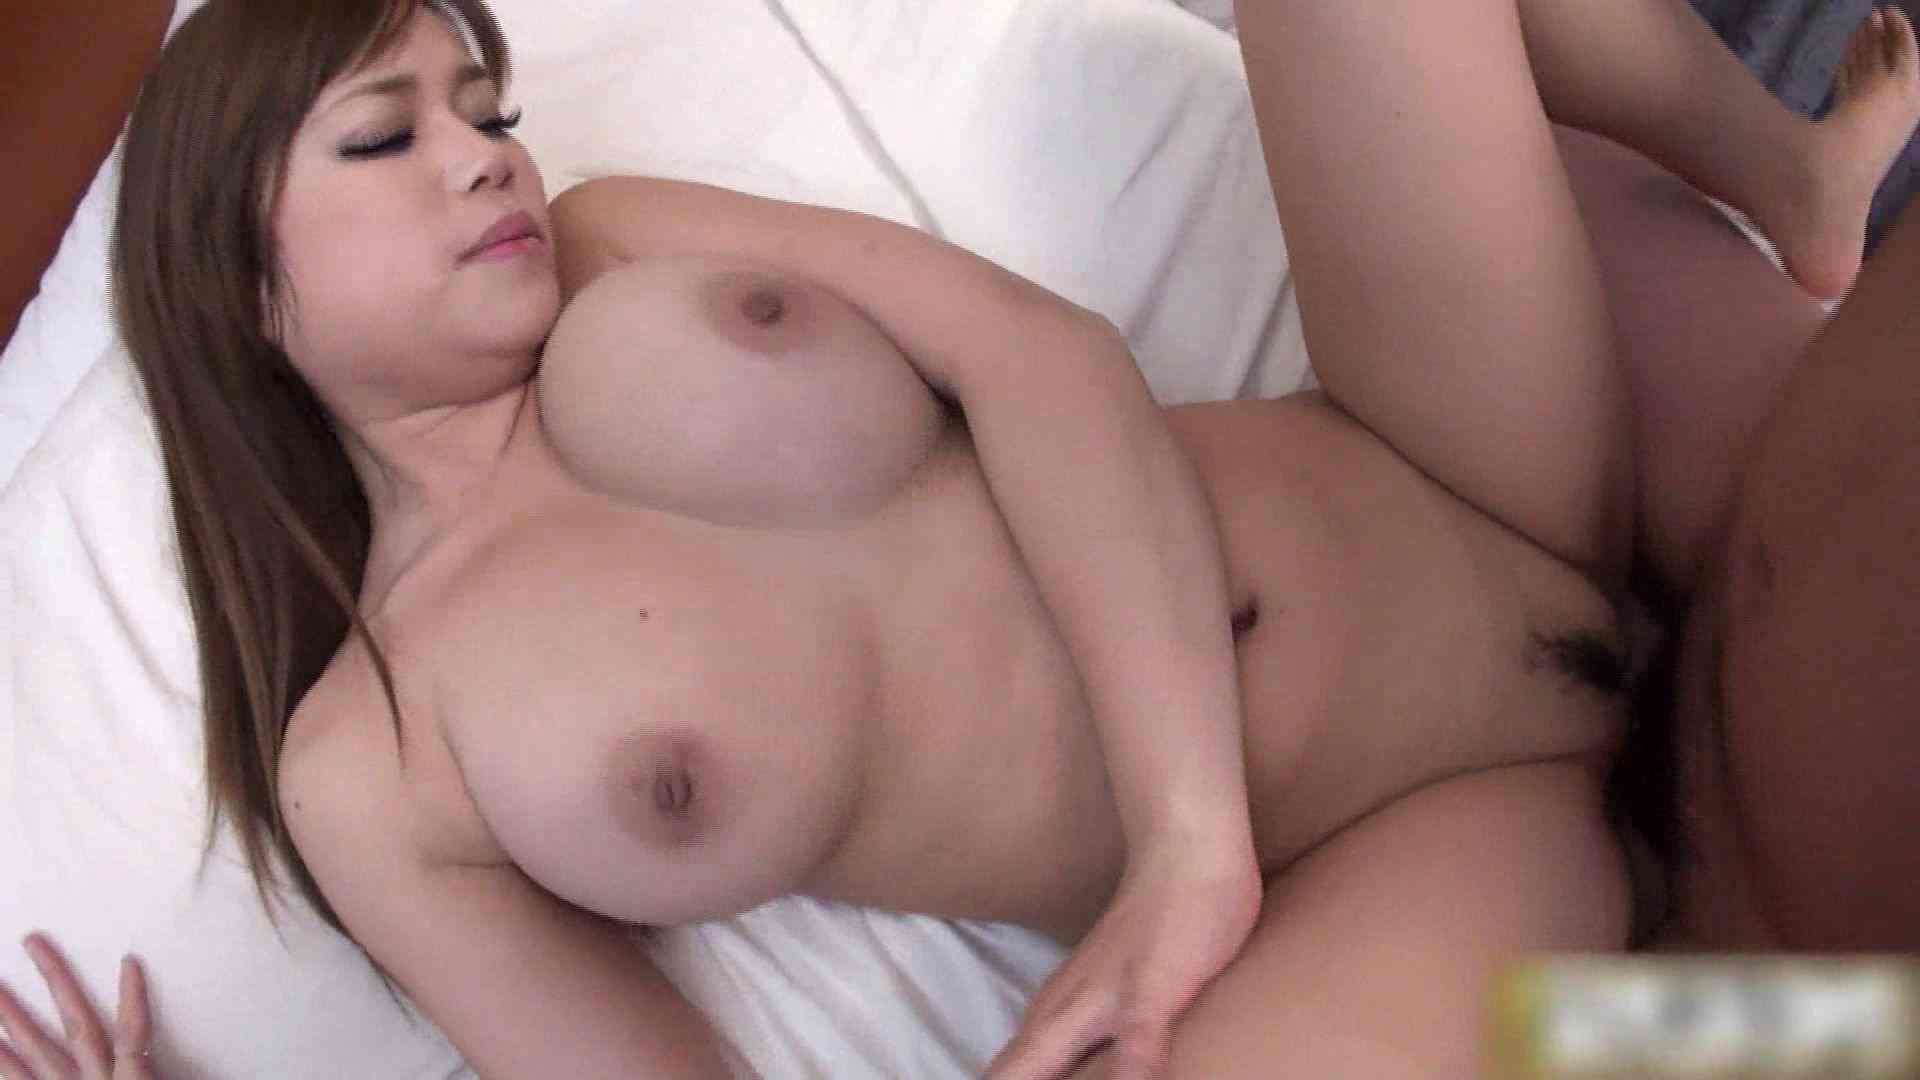 S級厳選美女ビッチガールVol.36 後編 OL  101枚 92